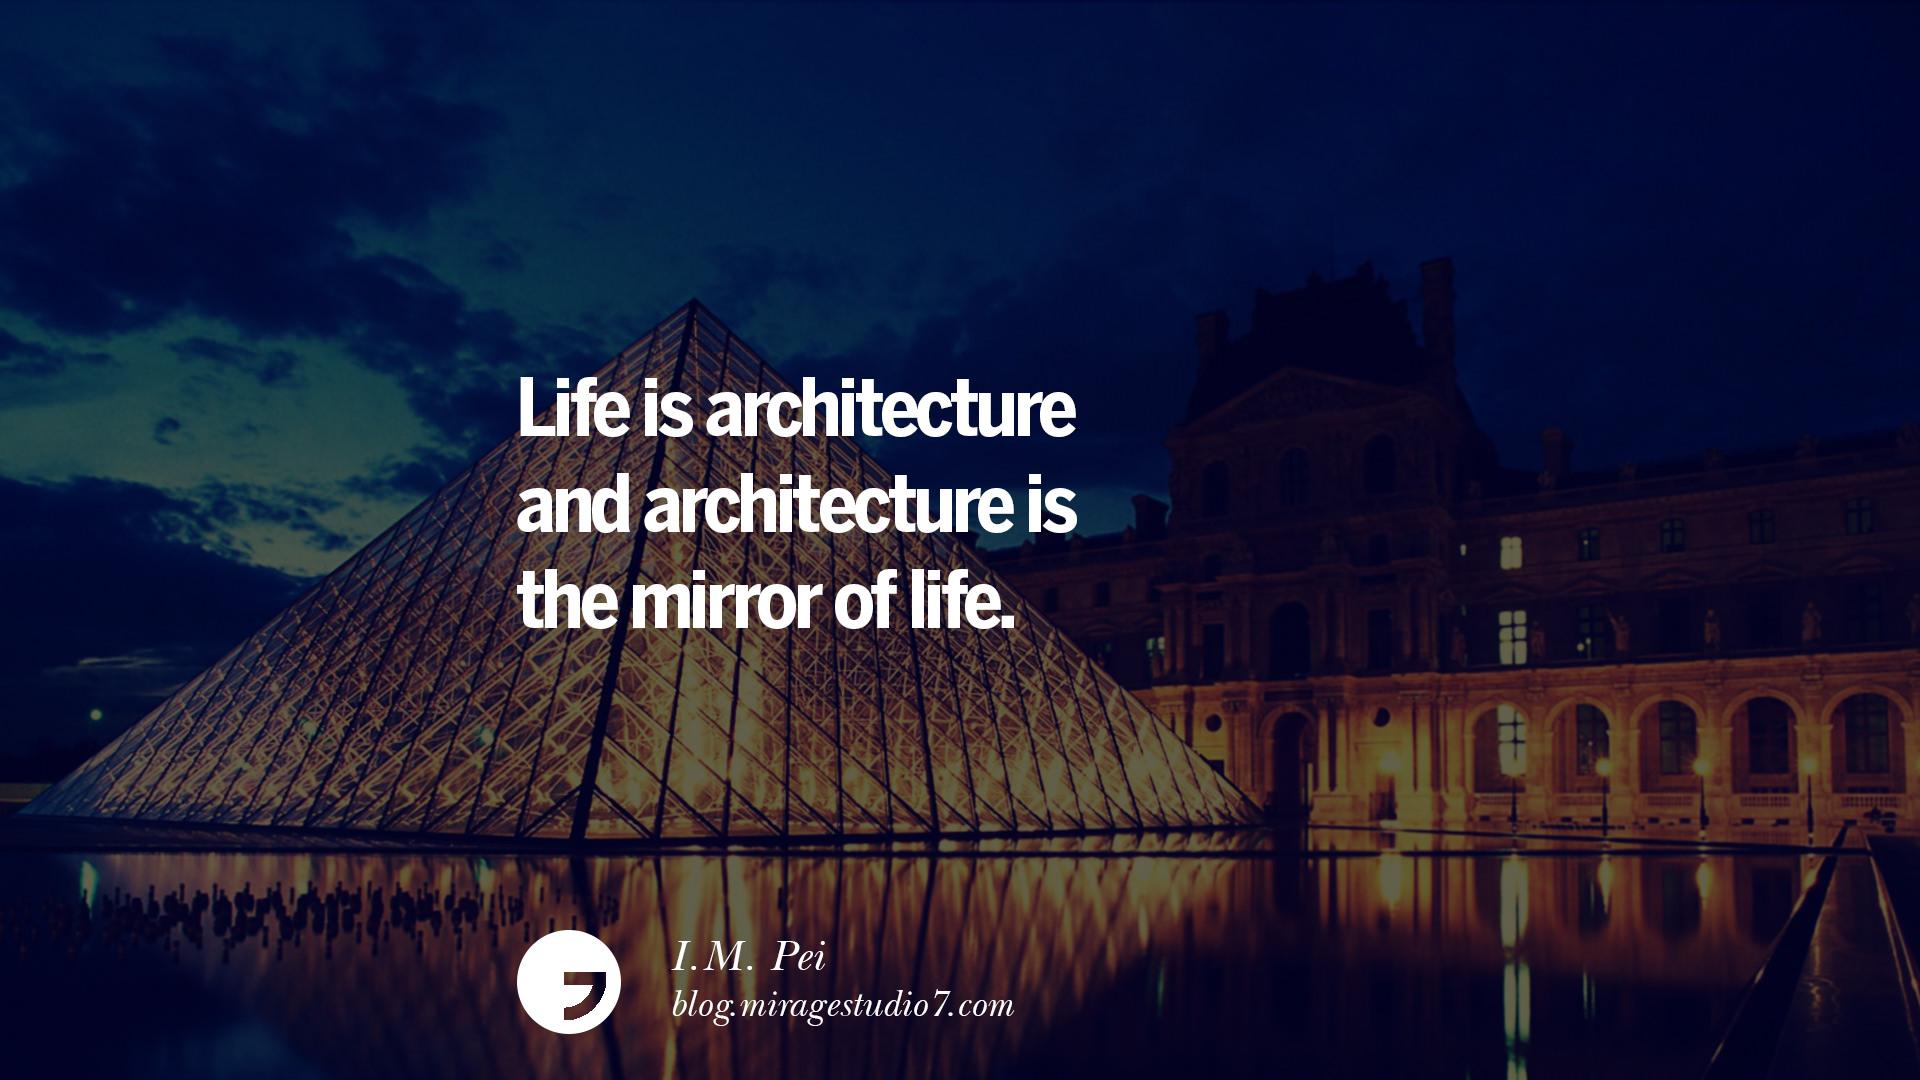 architecture quotes famous architects inspirational pei mirror interior designers architect light easy miragestudio7 room